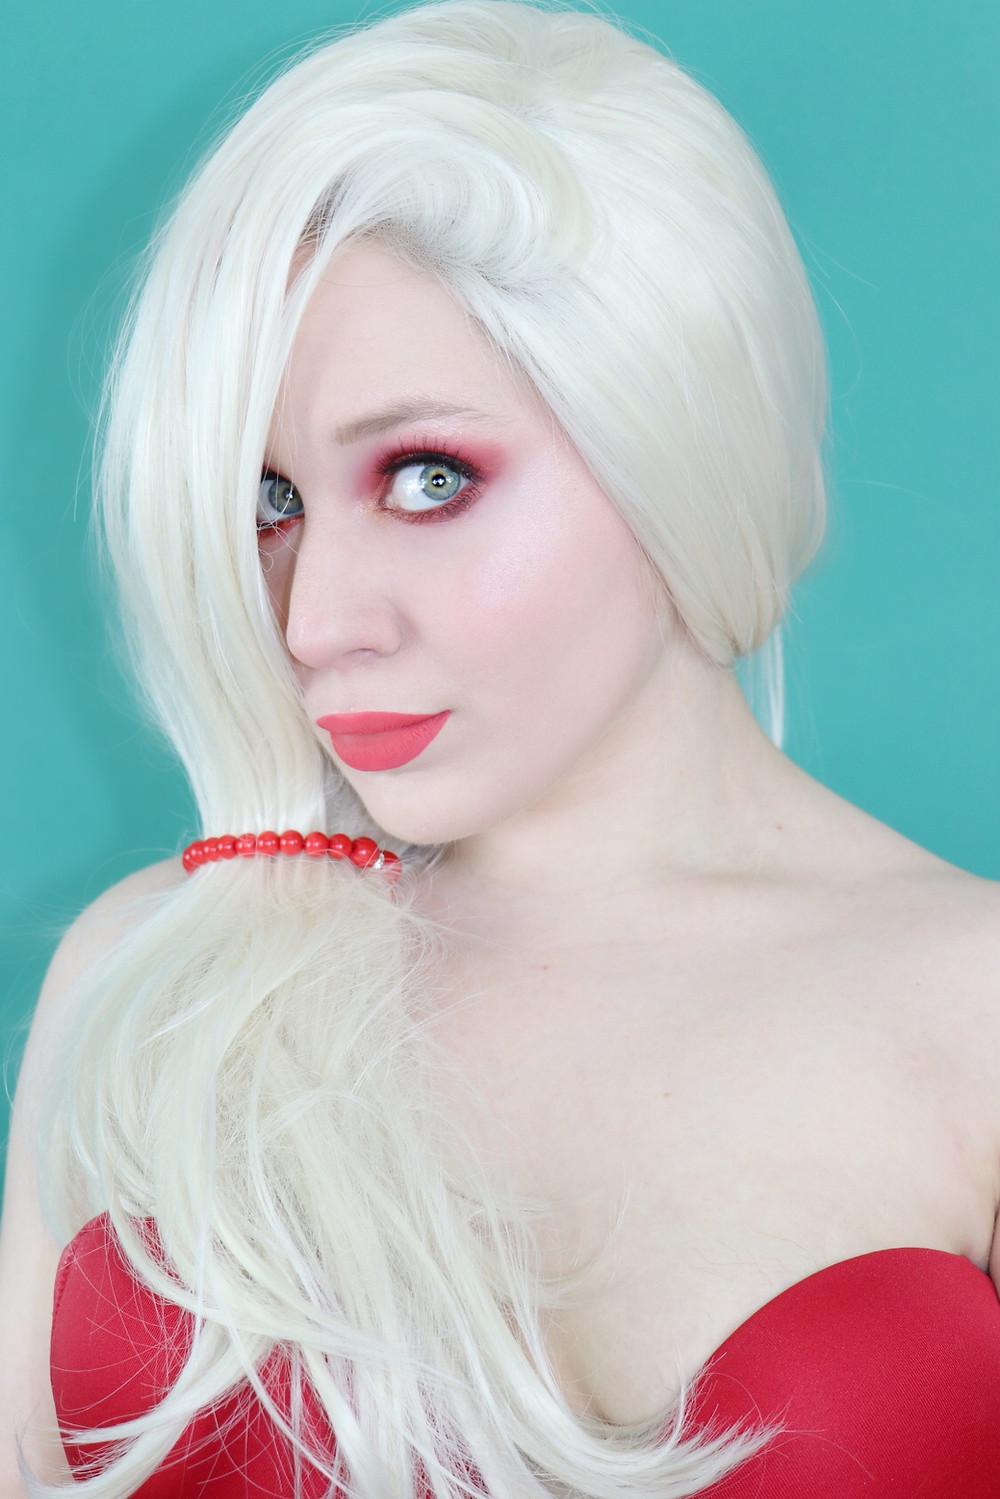 Arista Ariel's Sister The Little Mermaid Disney Makeup Tutorial Cosplay 2020 | Lillee Jean